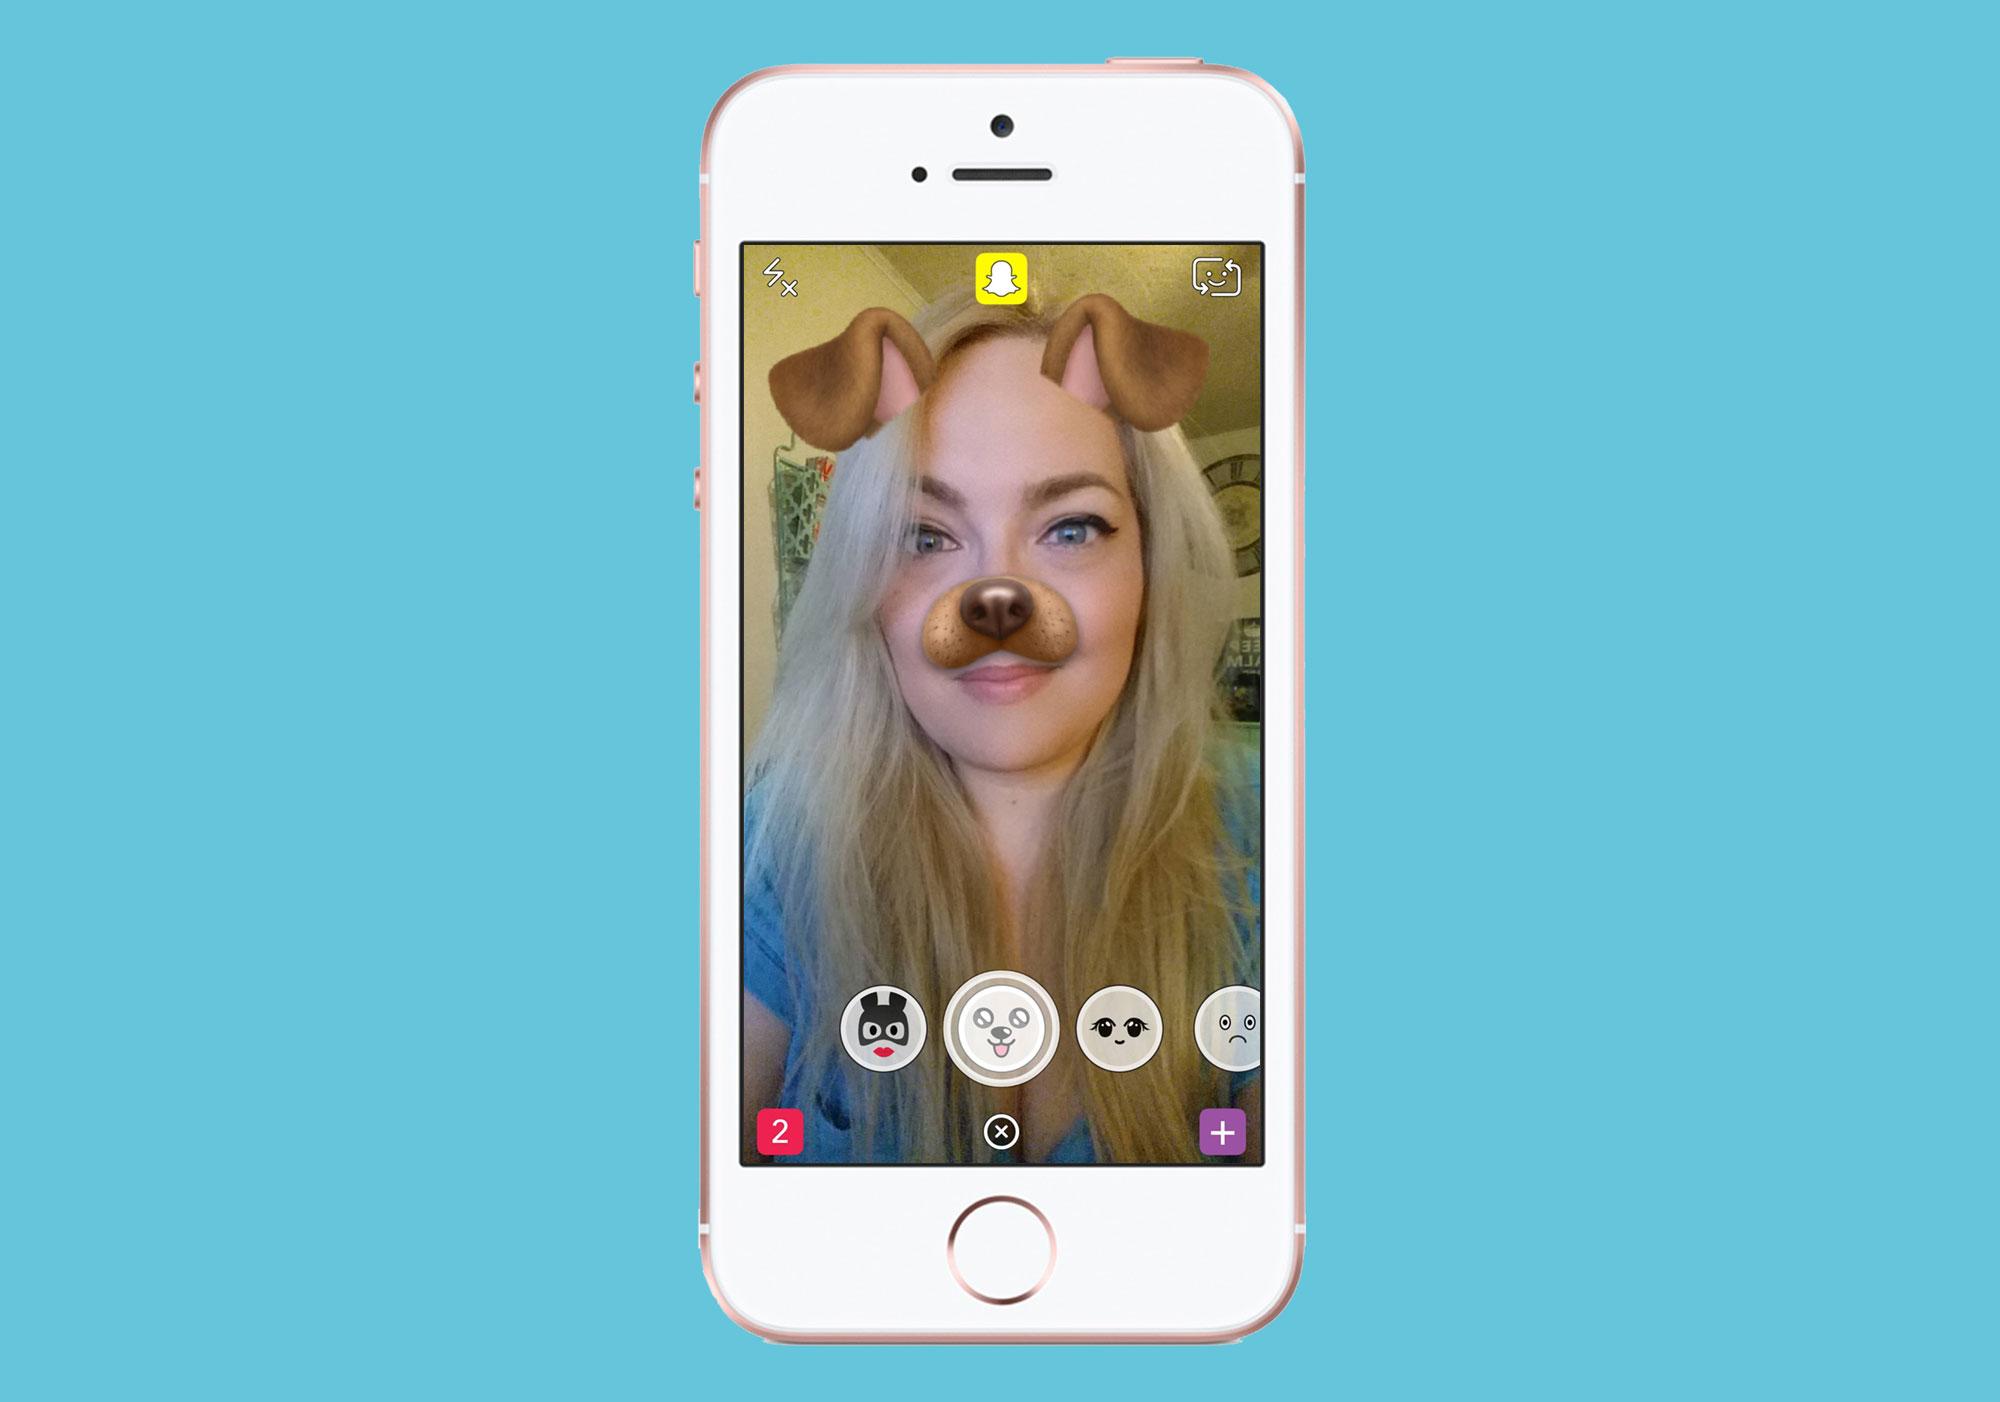 Uso de realidade aumentada no Snapchat